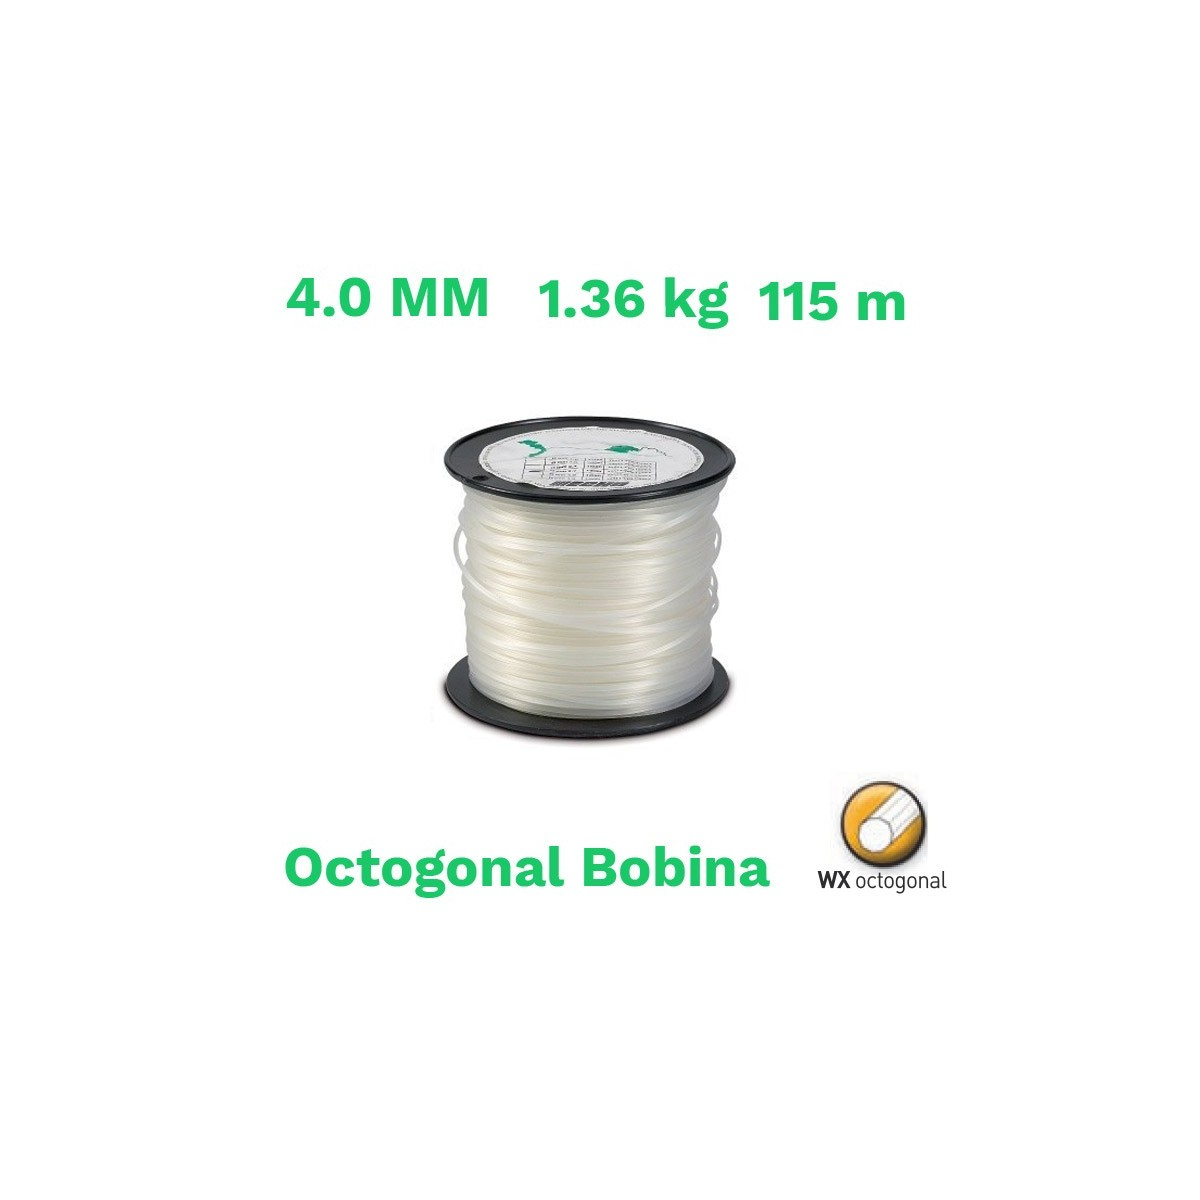 Echo hilo nylon octogonal bobina 4.0 mm 1.36 kg 115 m